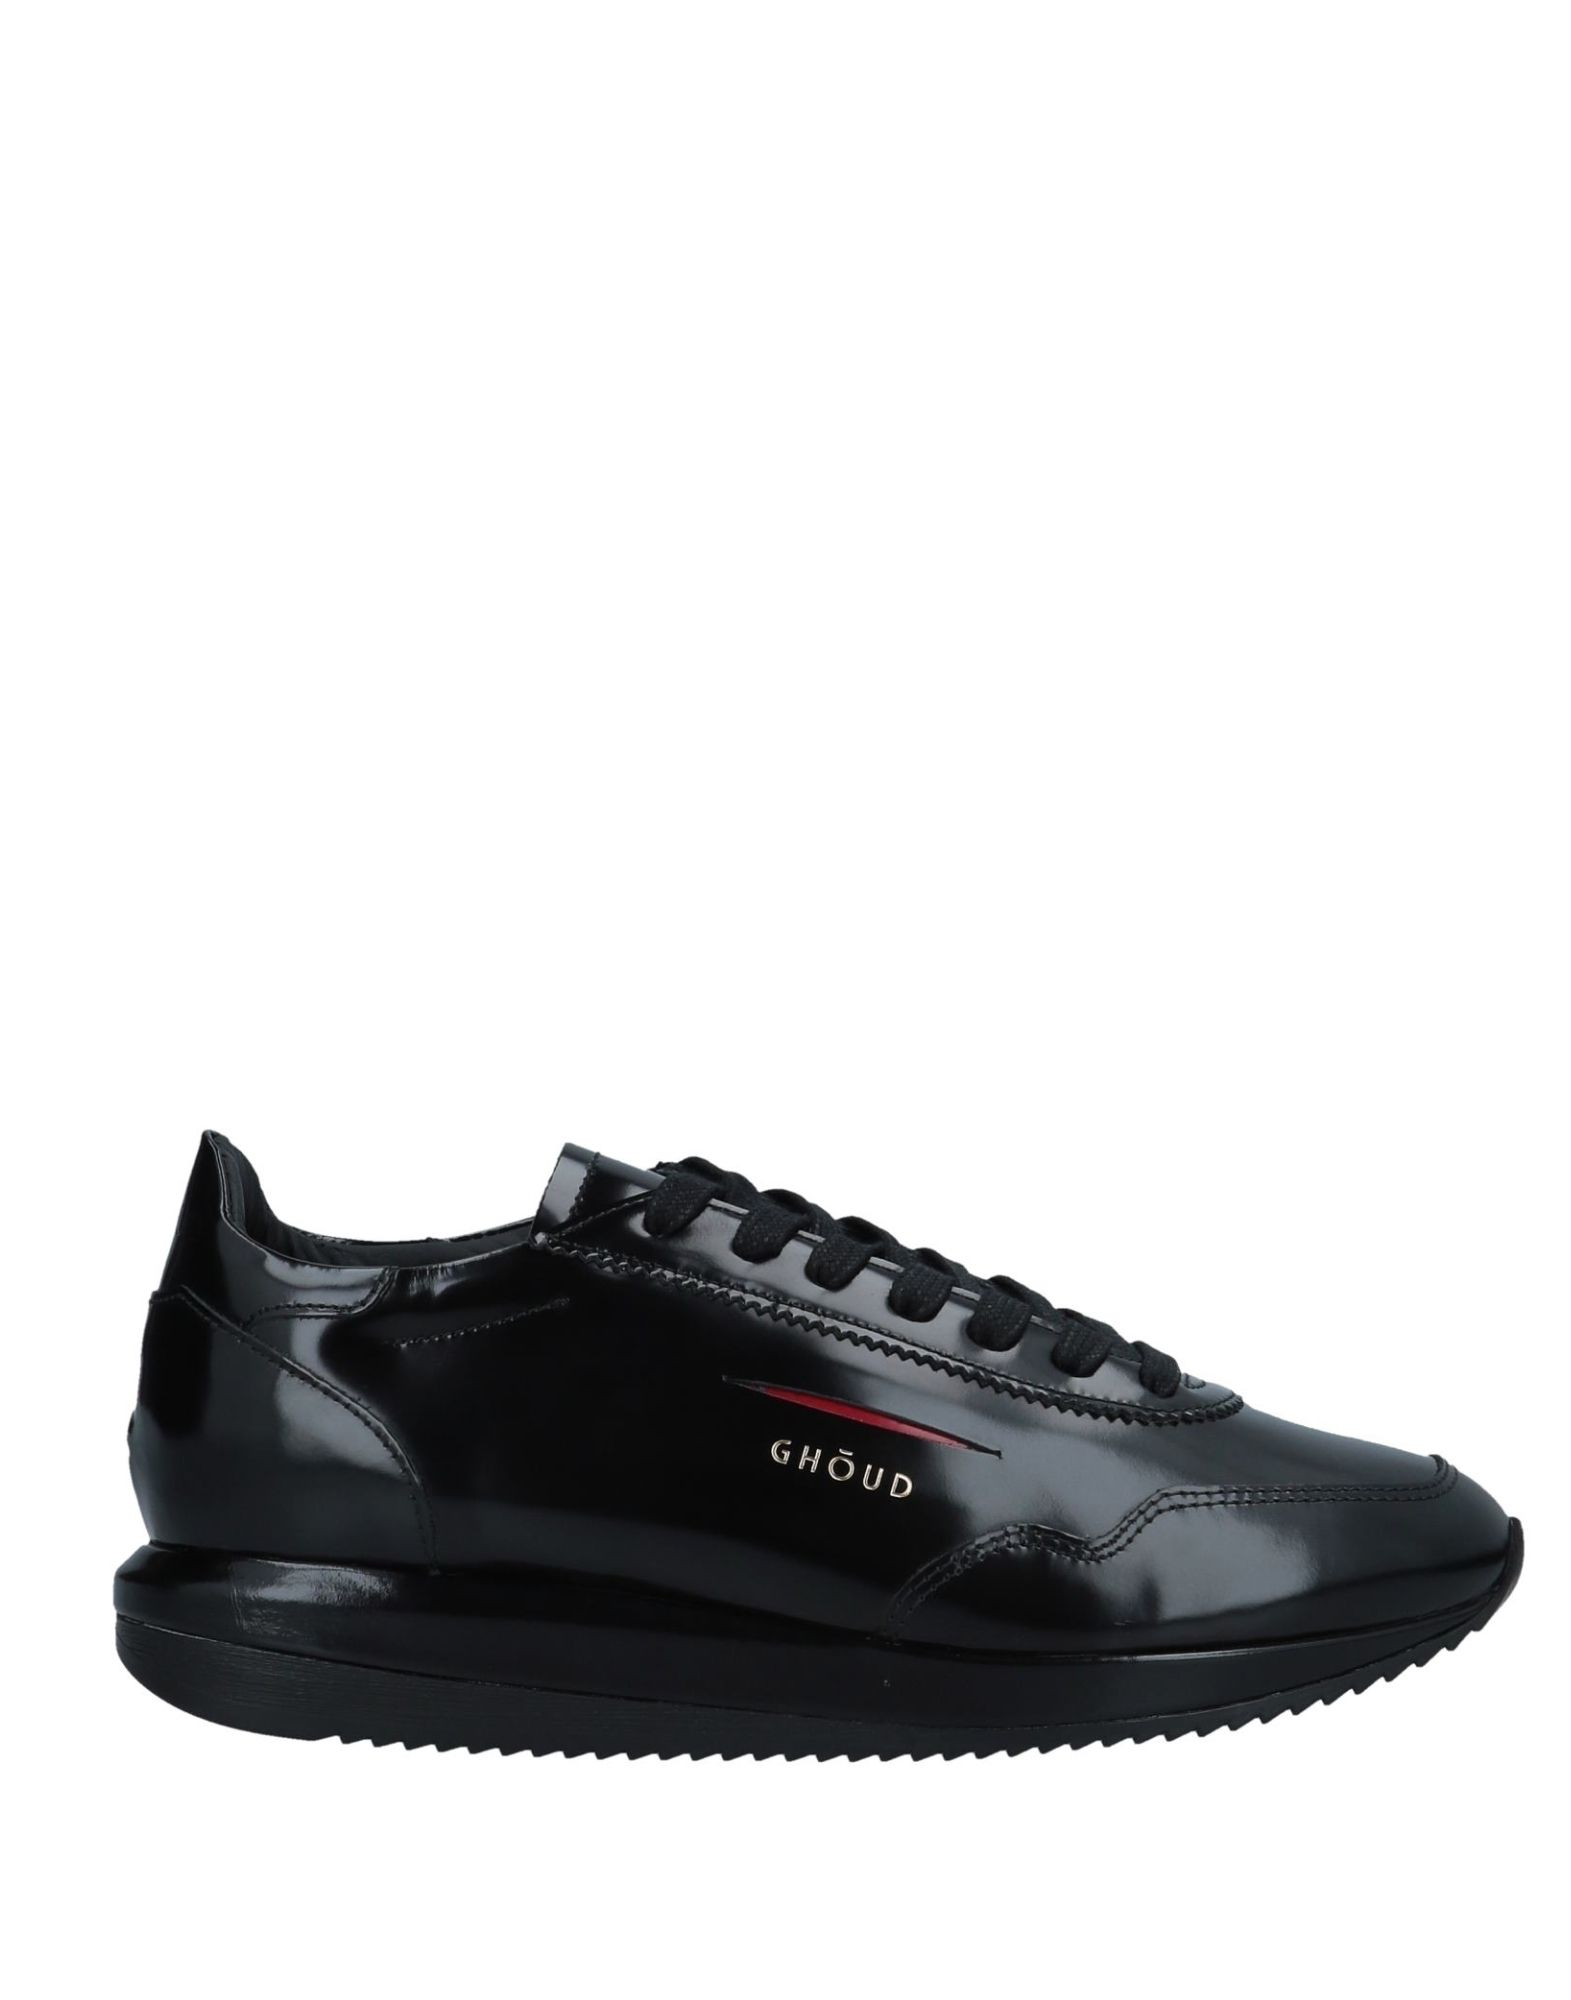 Ghōud Venice Sneakers Damen  11548850PNGut aussehende strapazierfähige Schuhe